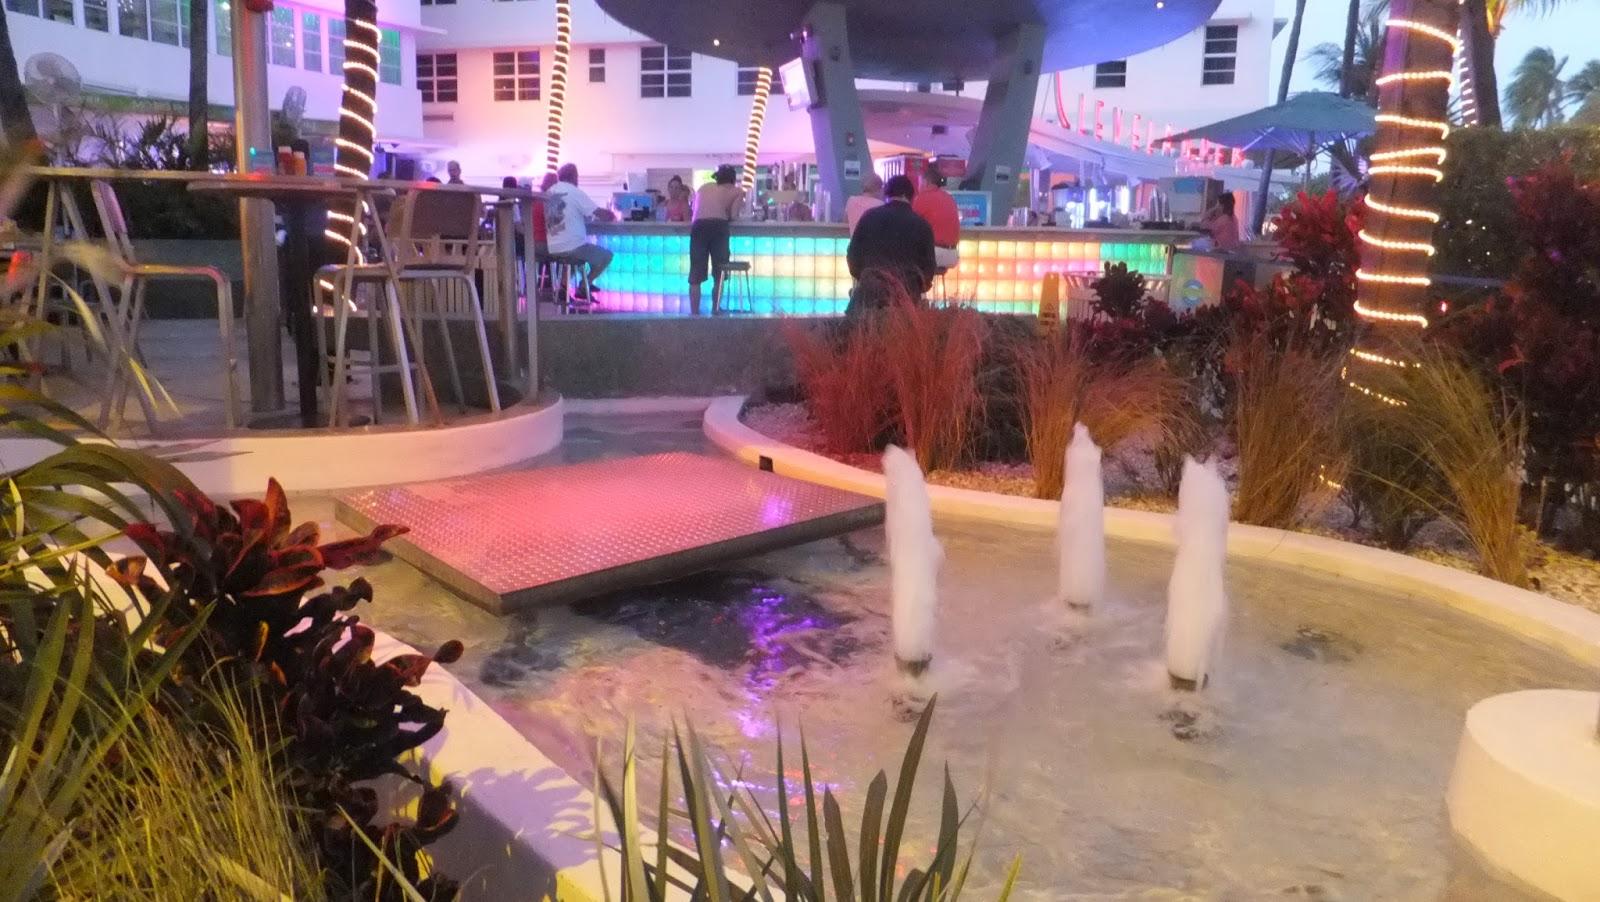 Clevelander, Ocean Drive, Miami Beach, SoBe, Florida, Elisa N, Blog de Viajes, Lifestyle, Travel